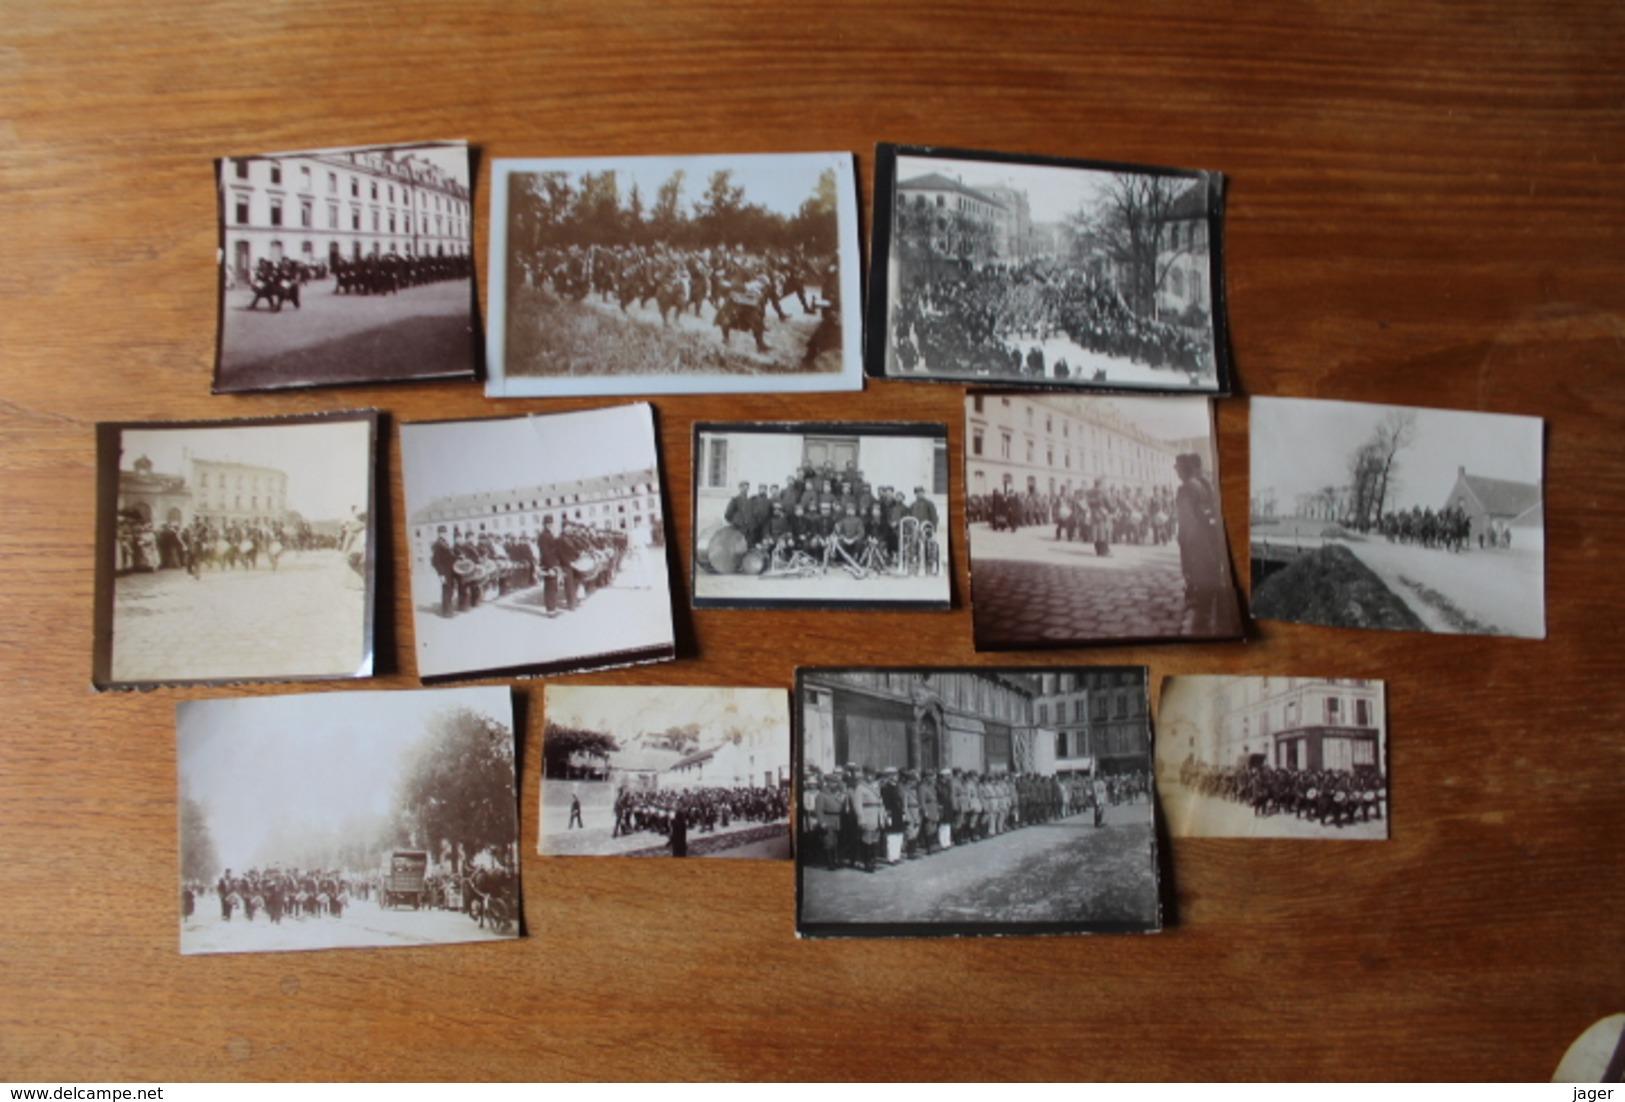 Lot De Photos De Clique Regimentaire 1890 1915 - Guerra, Militares